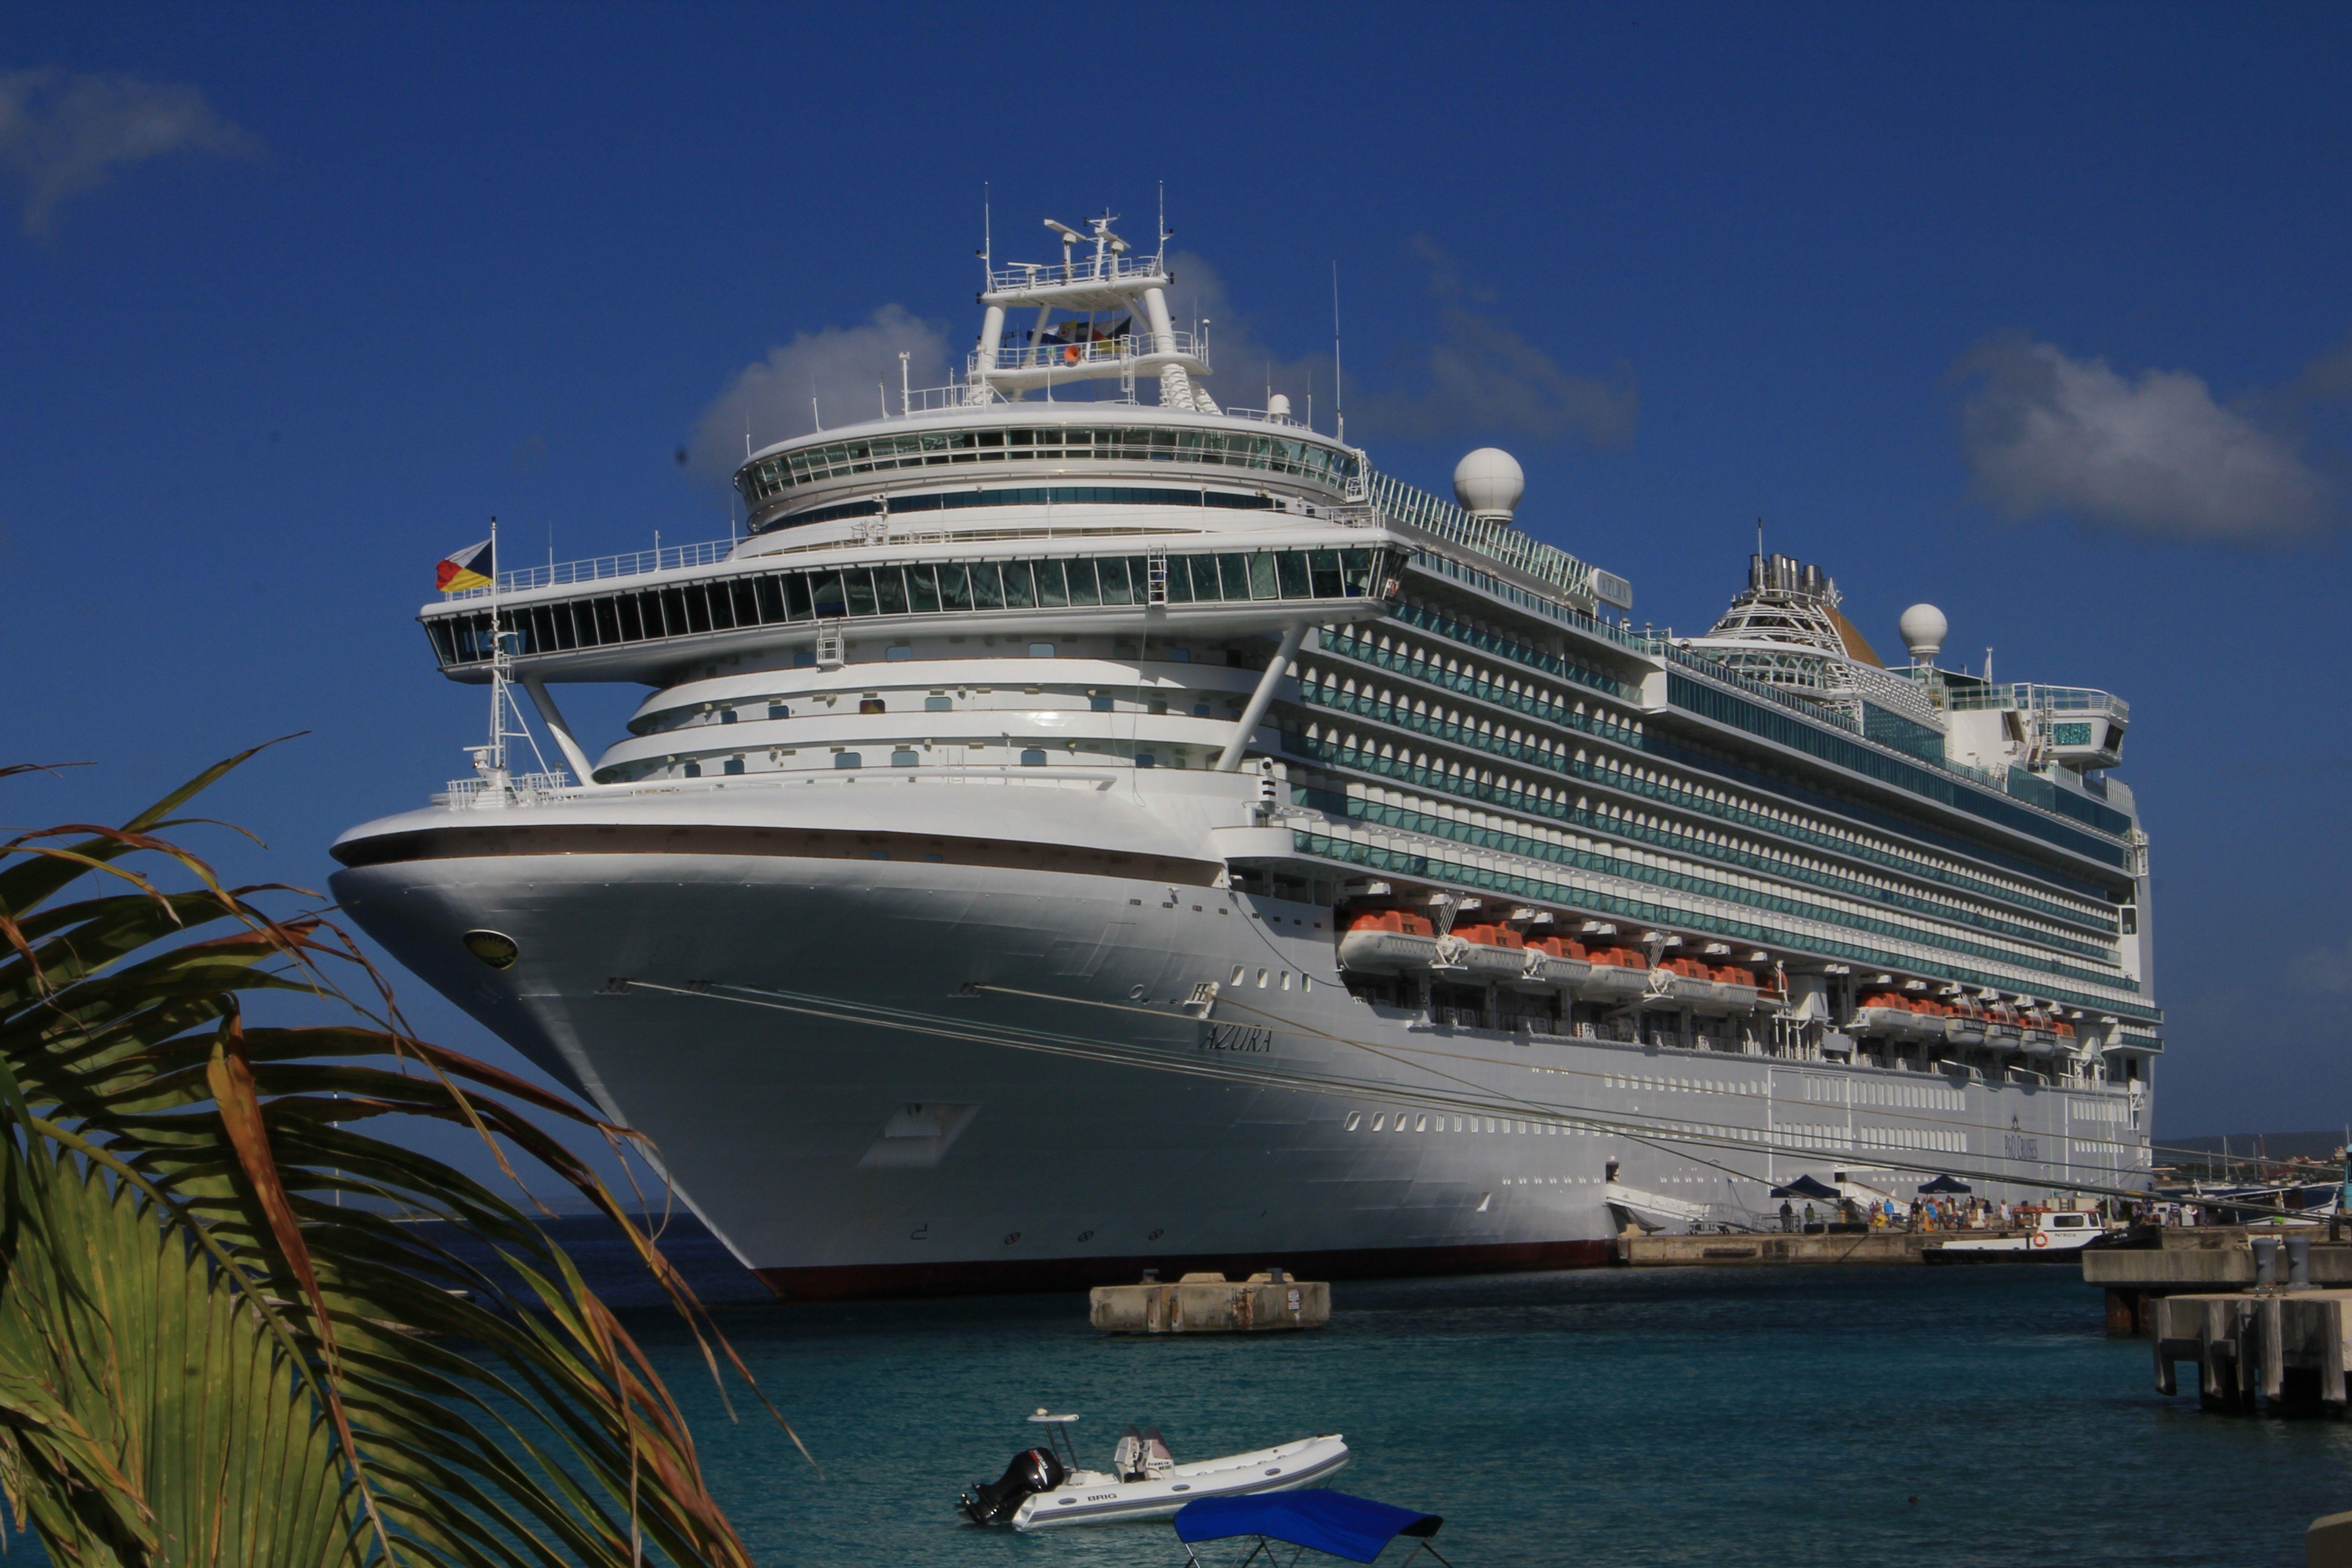 Explore The Beauty Of Caribbean: P&O Cruise Ship Azura, January 2015, Caribbean. Can You